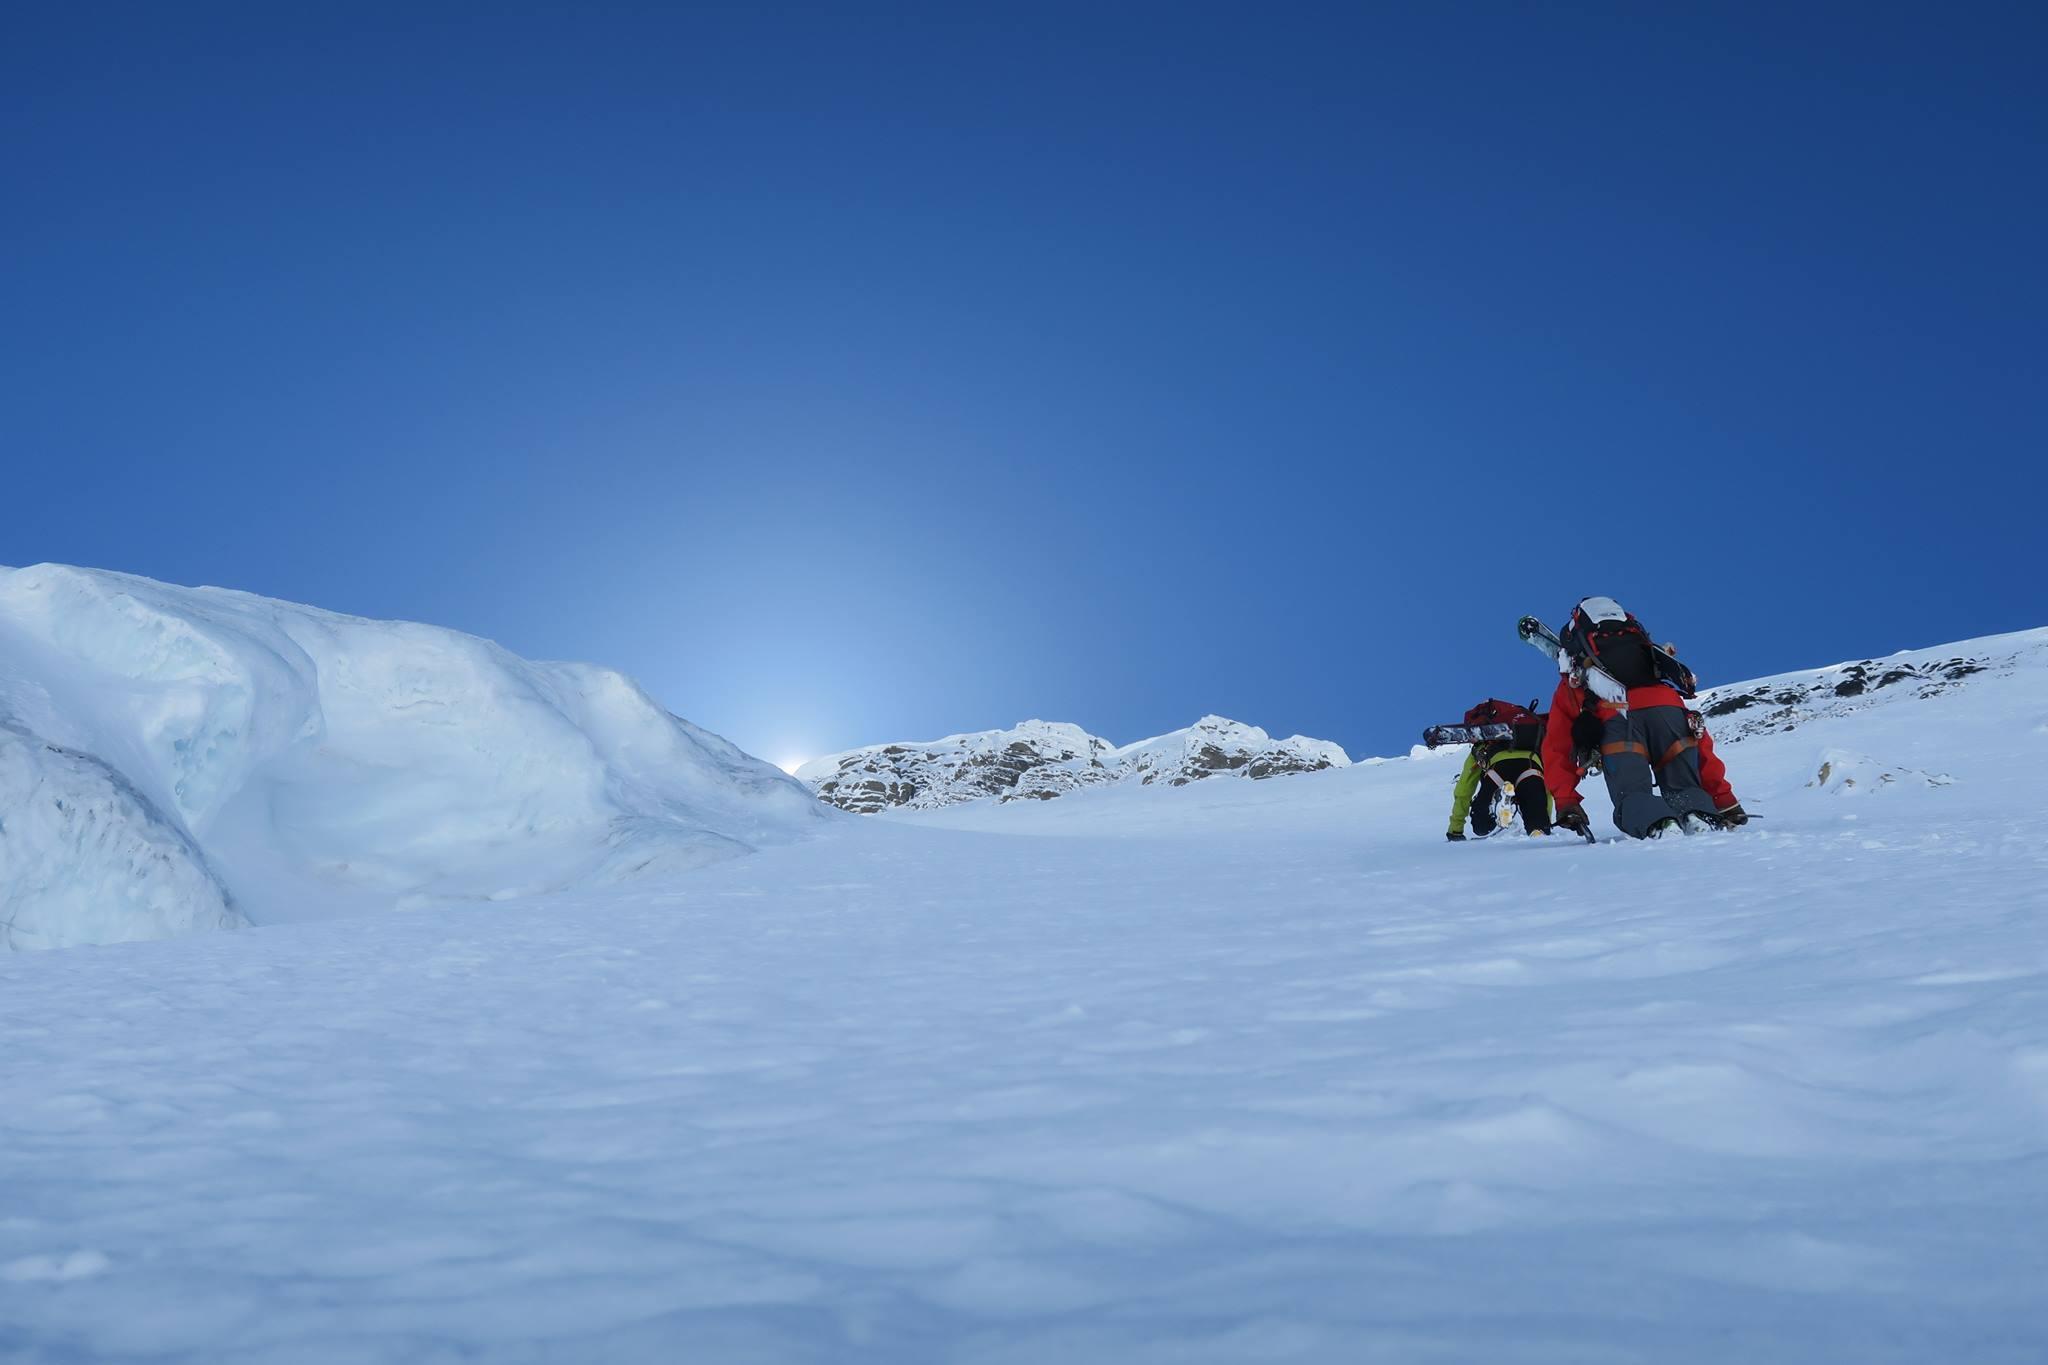 Climbing the line. McNab photo